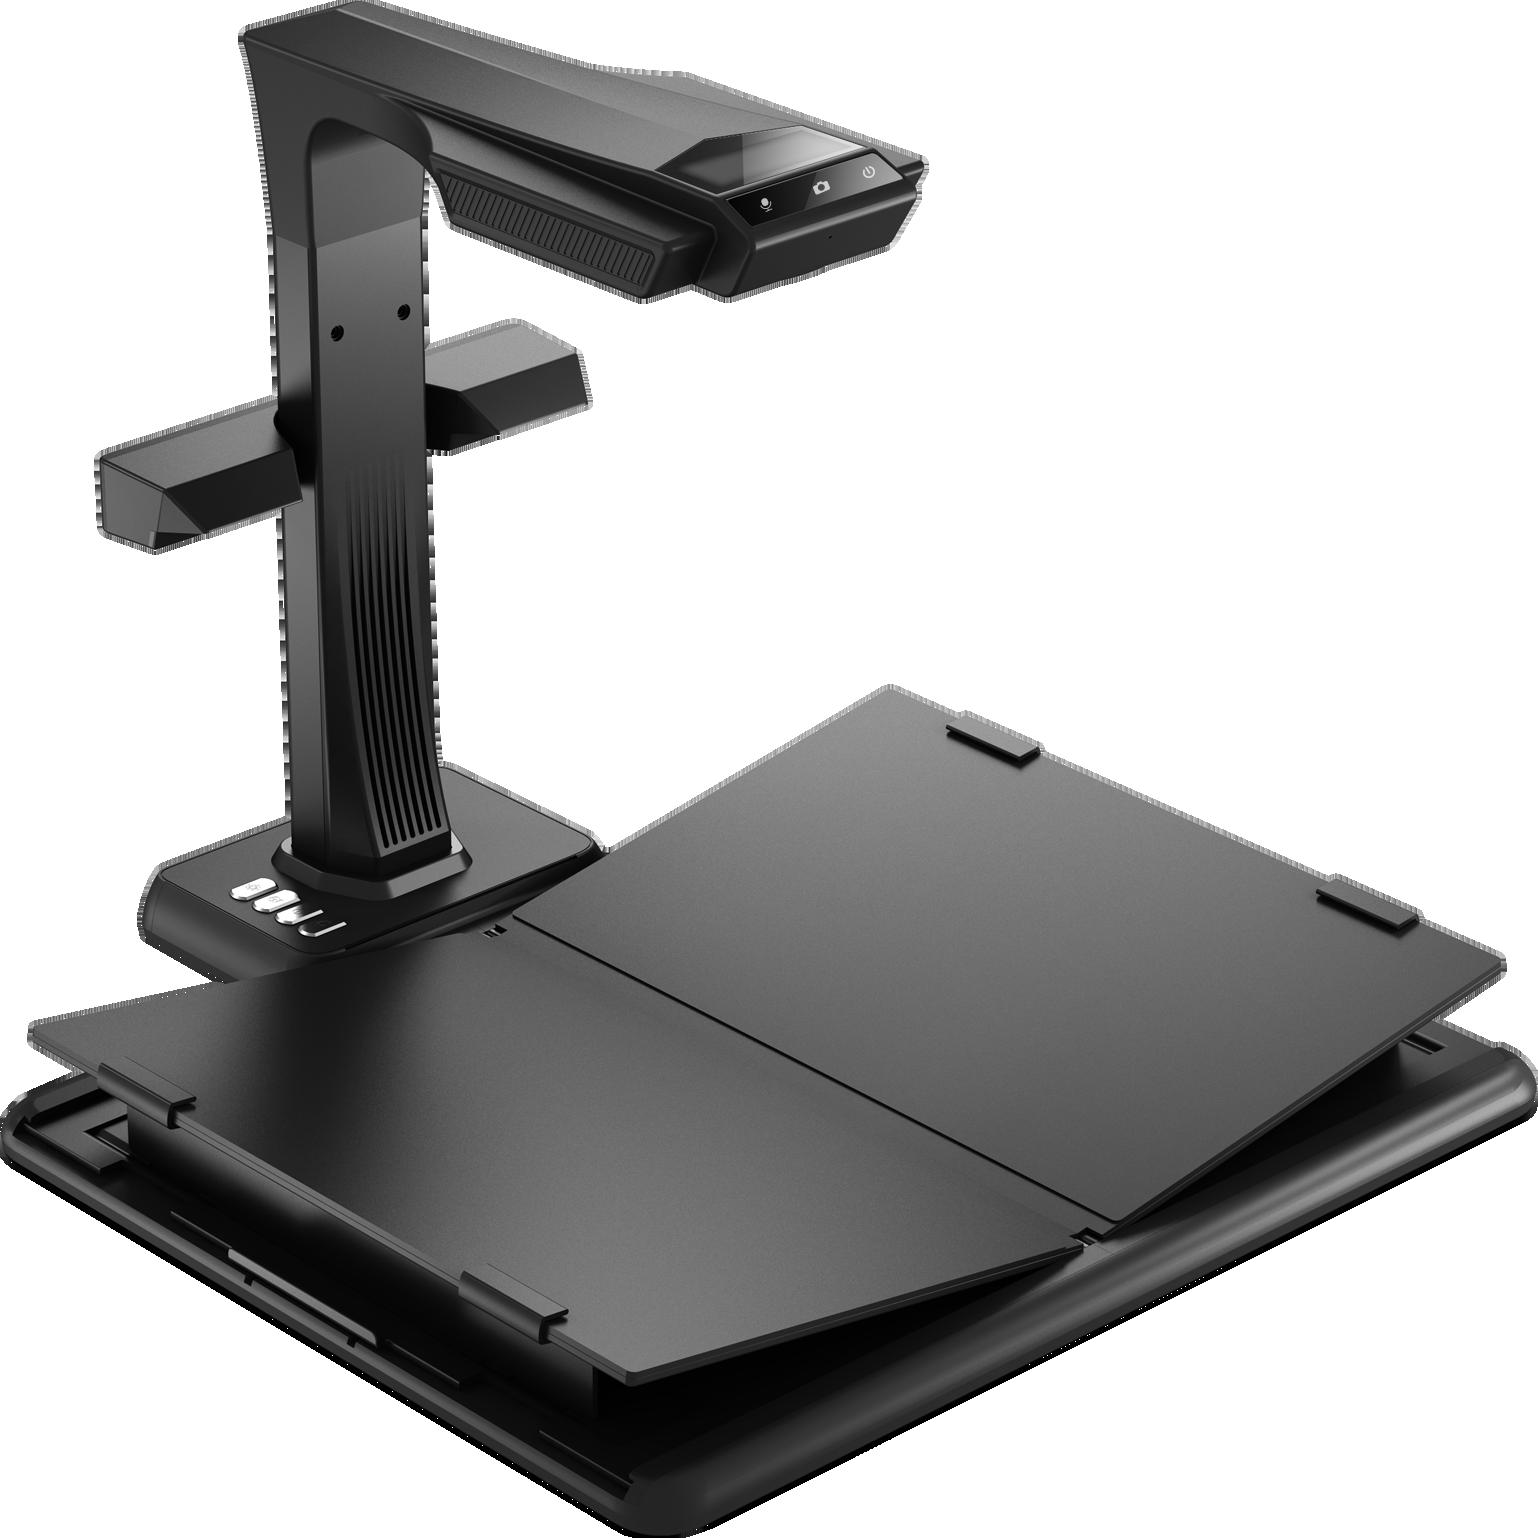 CZUR M3000 Pro Professional Book Scanner – Humanized V-Shaped Book Rest